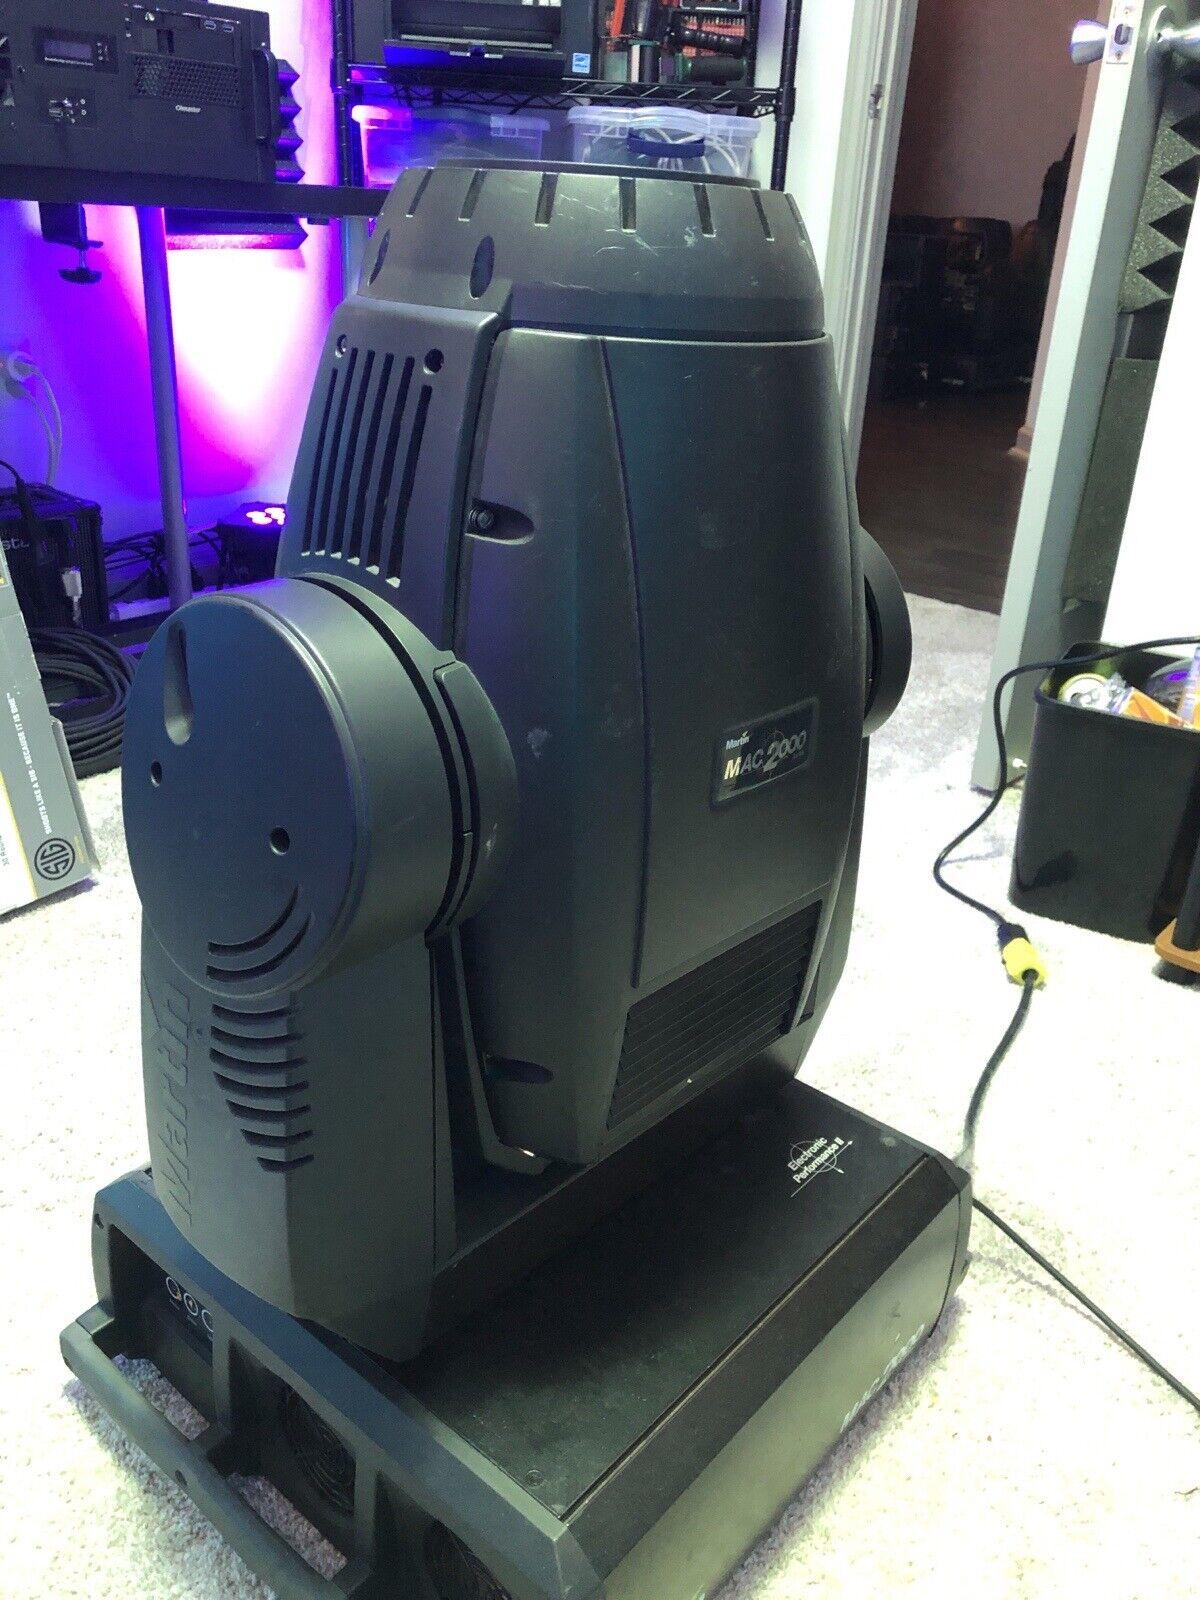 Martin Mac 2000 Performance II E Moving Head Stage Light - New Lamp Read